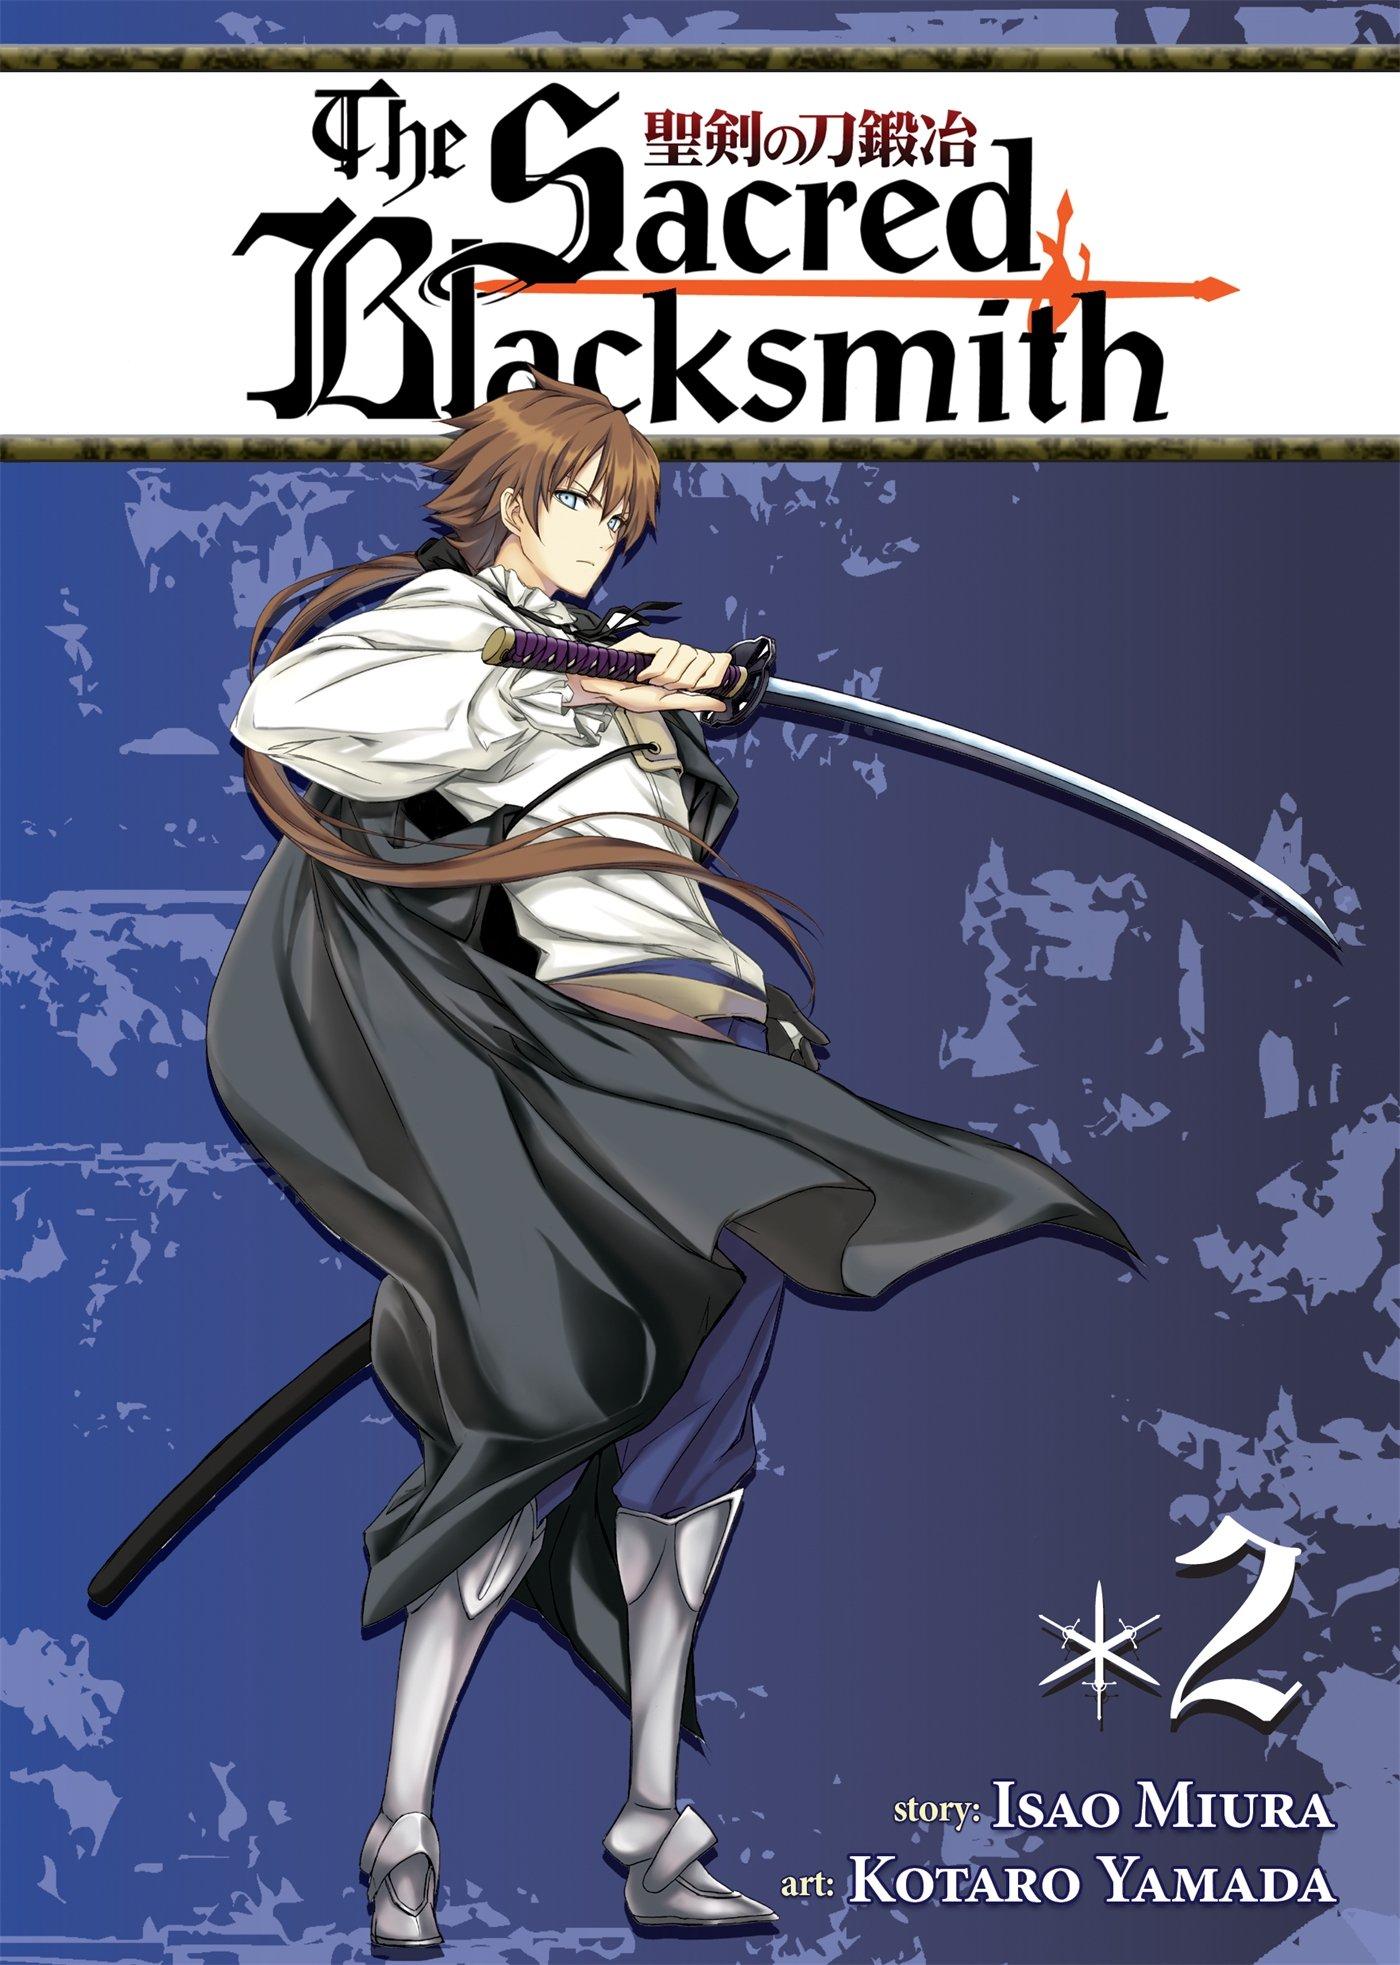 Sacred Blacksmith Vol 1,2,3,4,5,6,7,8,9,10 Manga Graphic Novels Set English